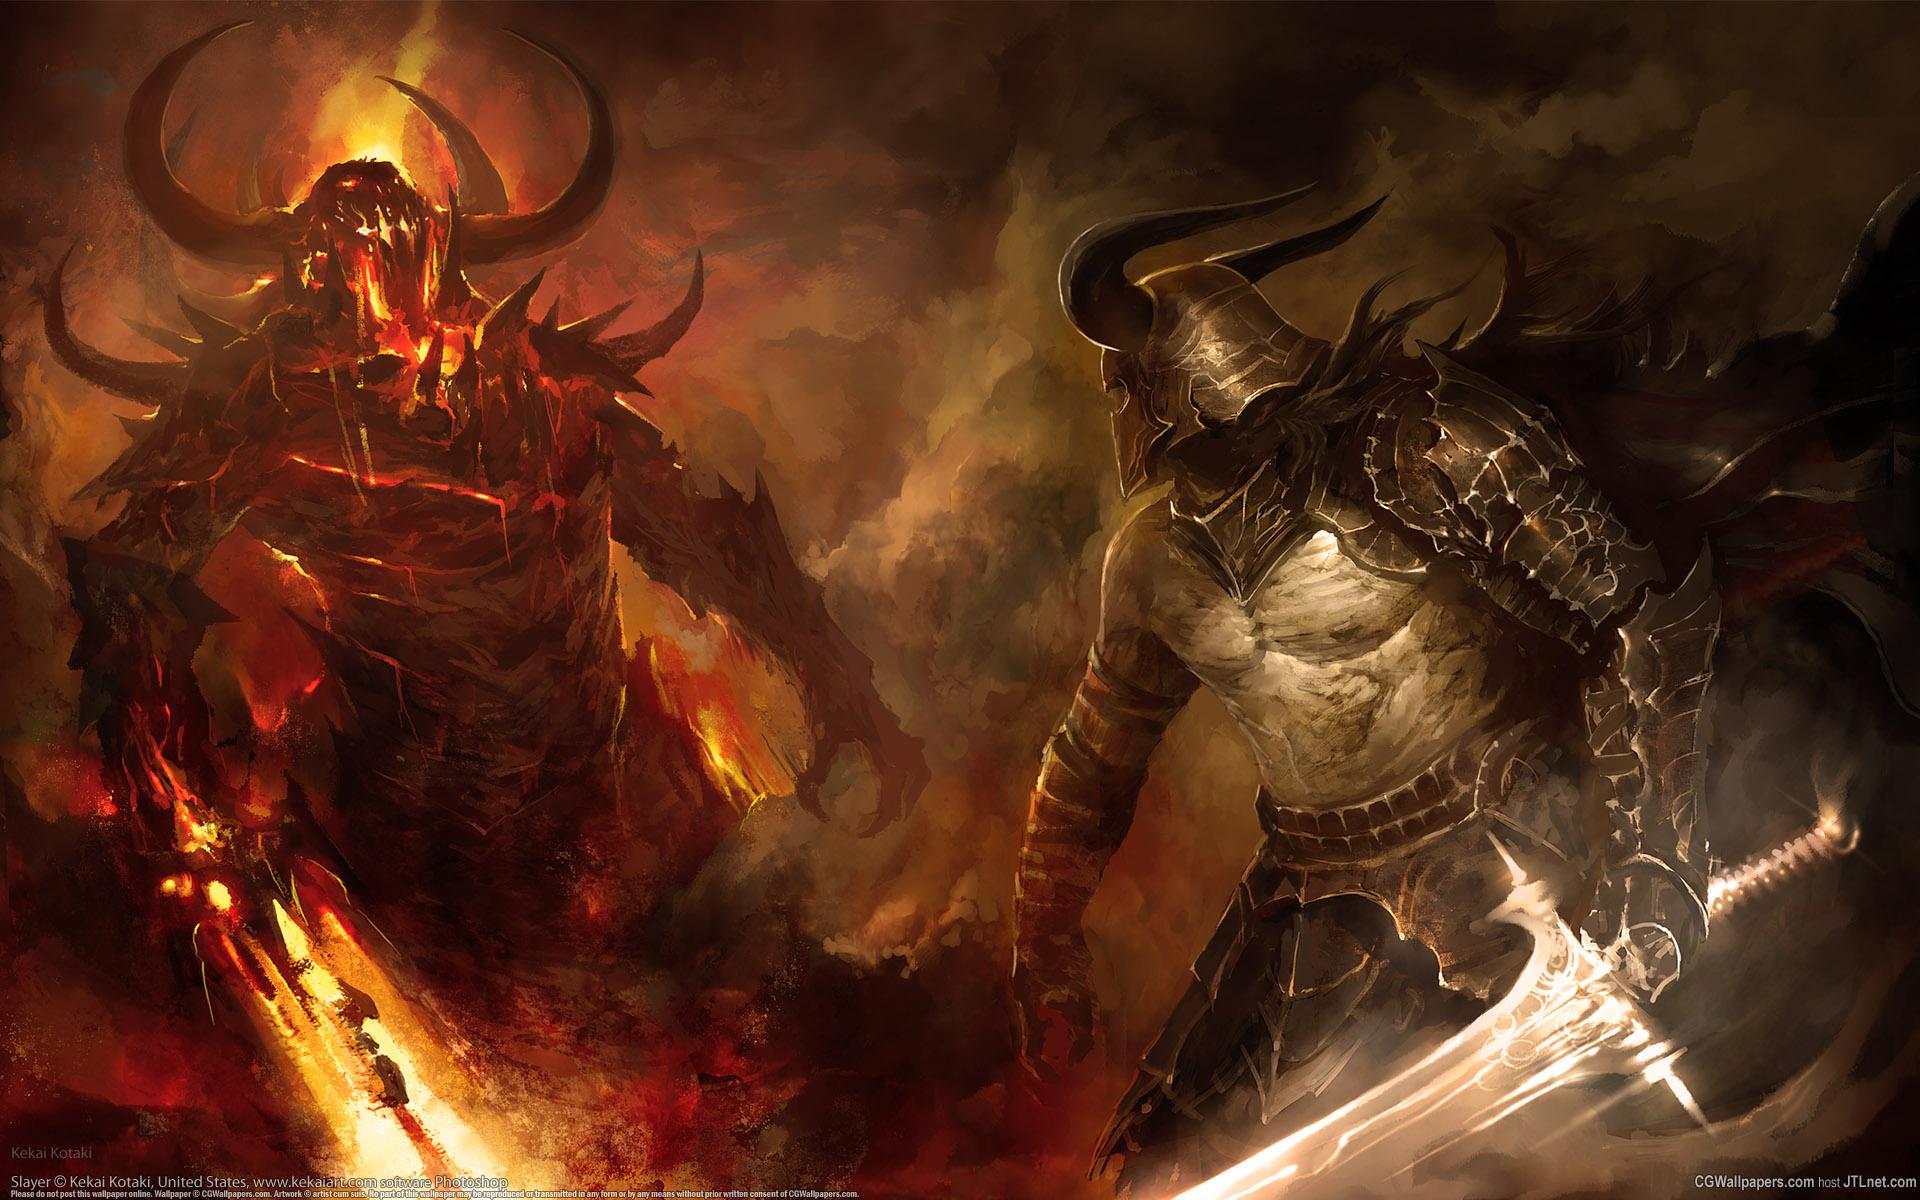 Battle Fight Swords Demon Knight Wide Wallpaper #120510 - Resolution 1920x1200 px